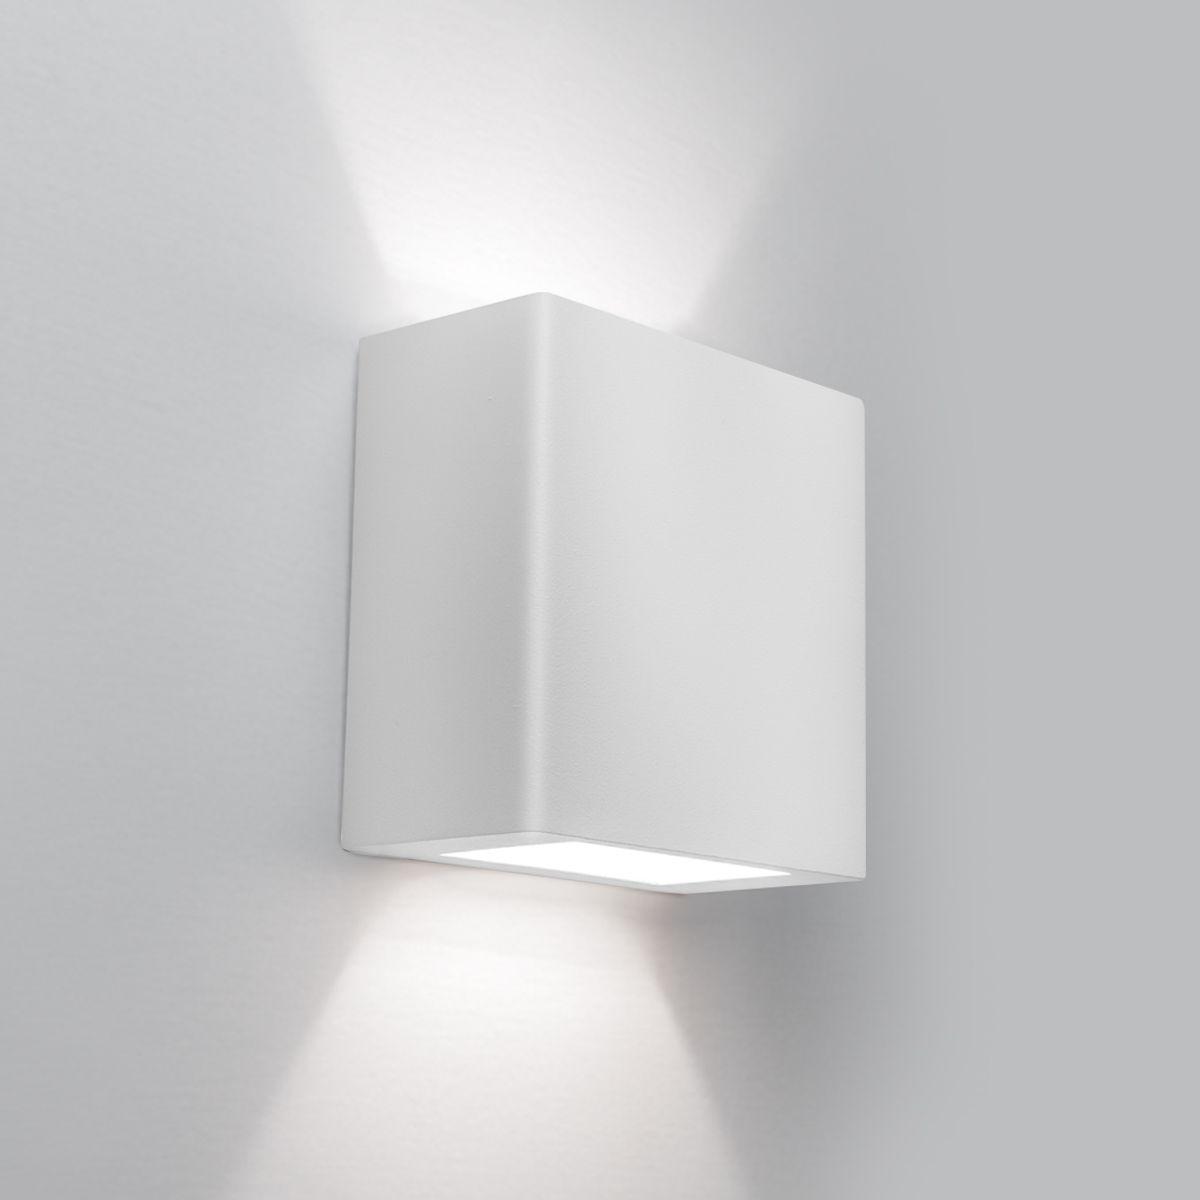 Arandela LED Newline 9585LED2 New Clean Externa 2 Fachos IP43 12W 2700K 220V 100x50x100mm